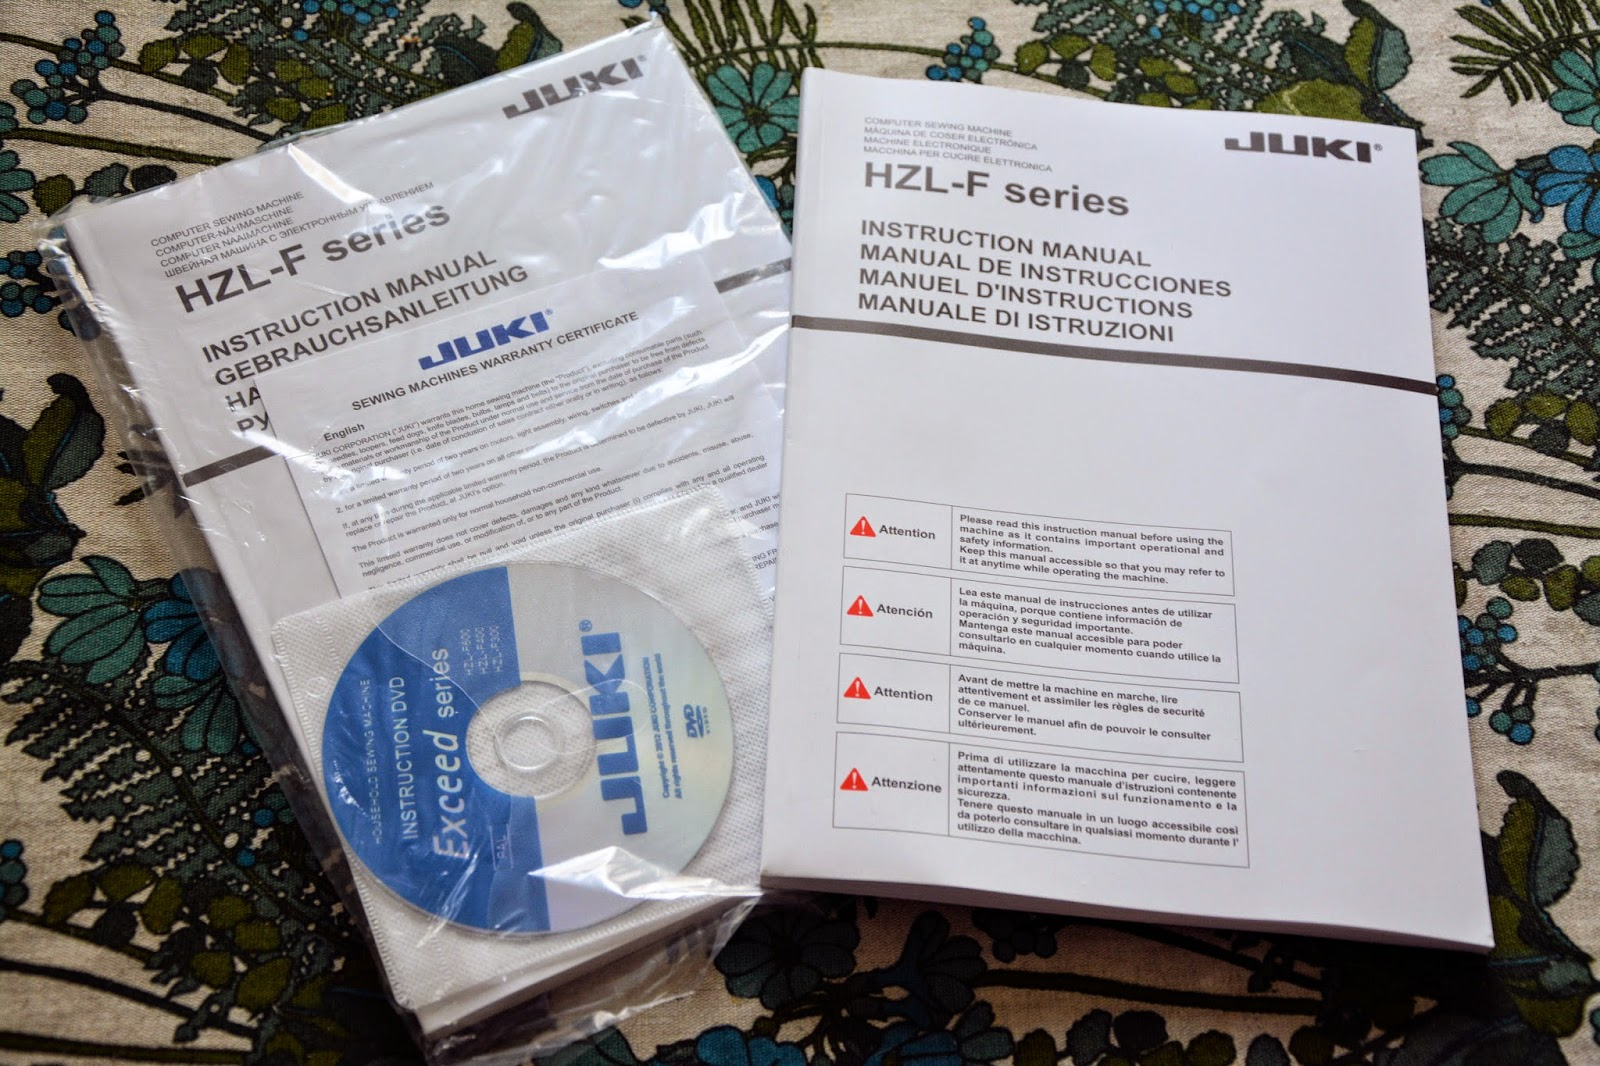 инструкция для juki hzl-f